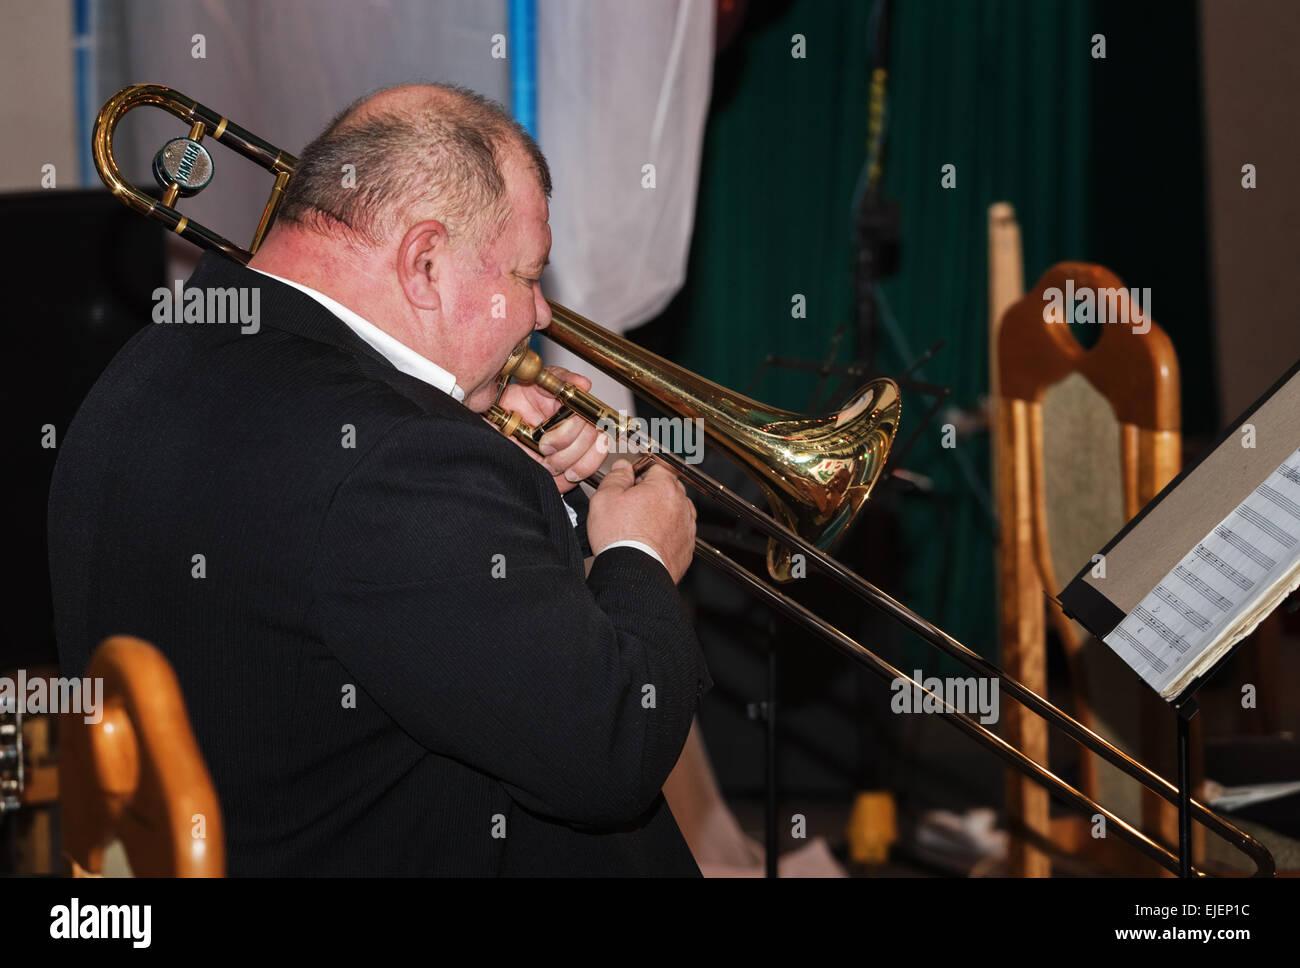 Contrabass Trombone Stock Photos & Contrabass Trombone Stock